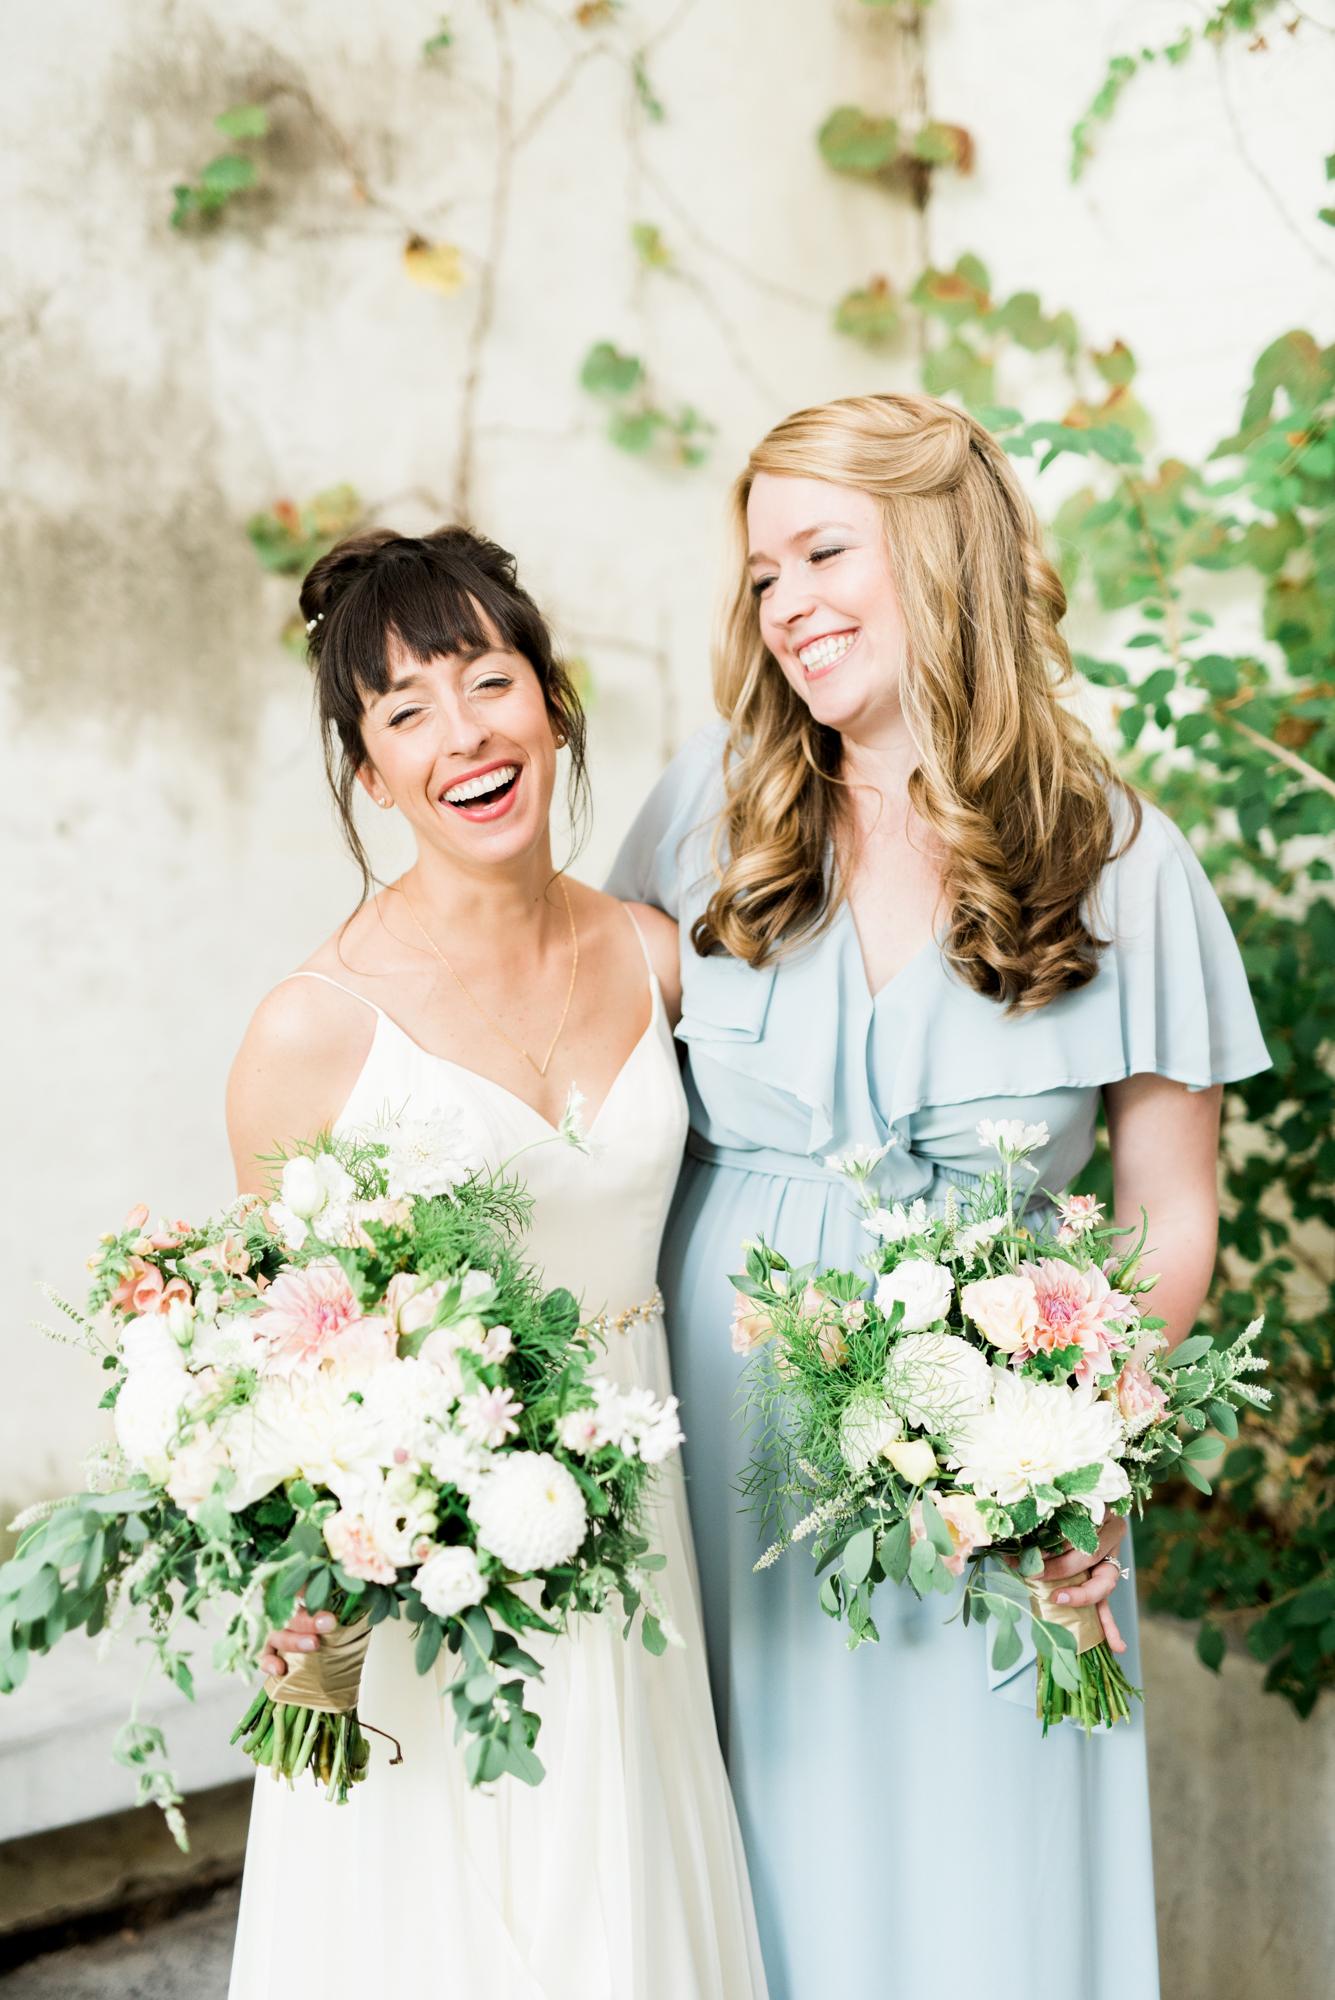 haley-richter-photography-maas-building-summer-wedding-philadelphia-DIY-birchtree-105.jpg